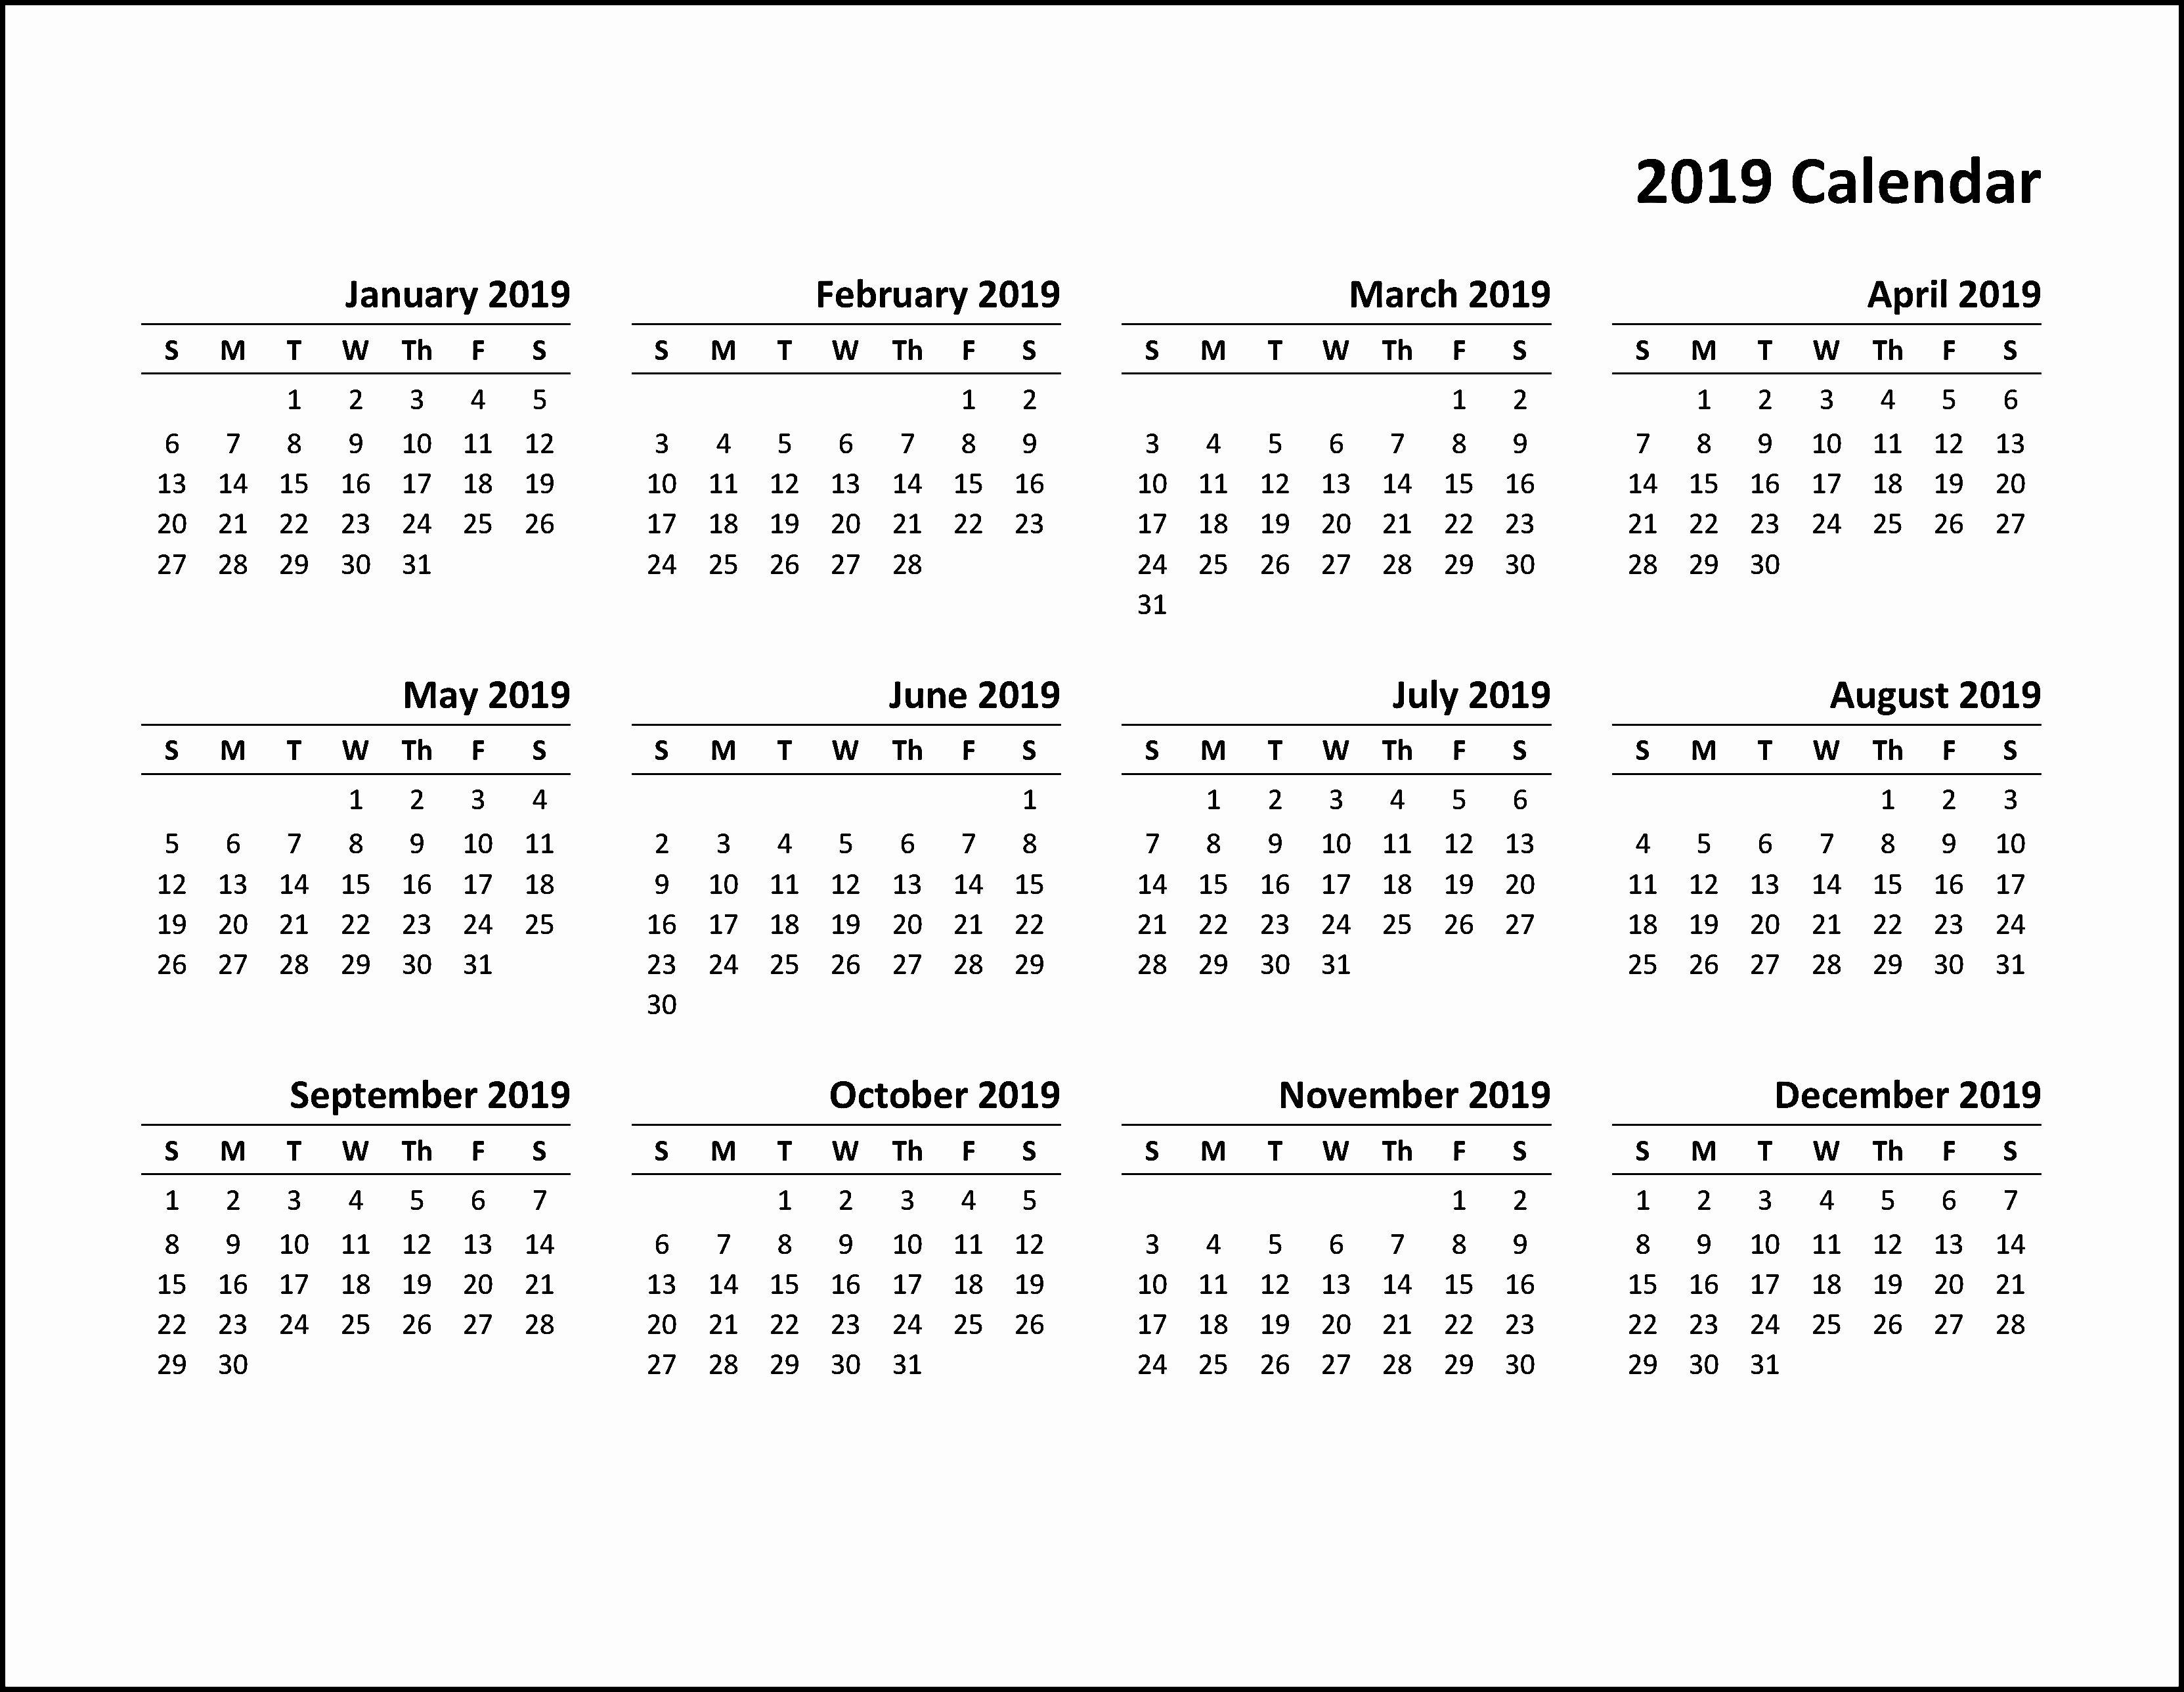 Free 2019 Calendar Template Lovely Printable Calendar 2019 Pdf Calendar2019